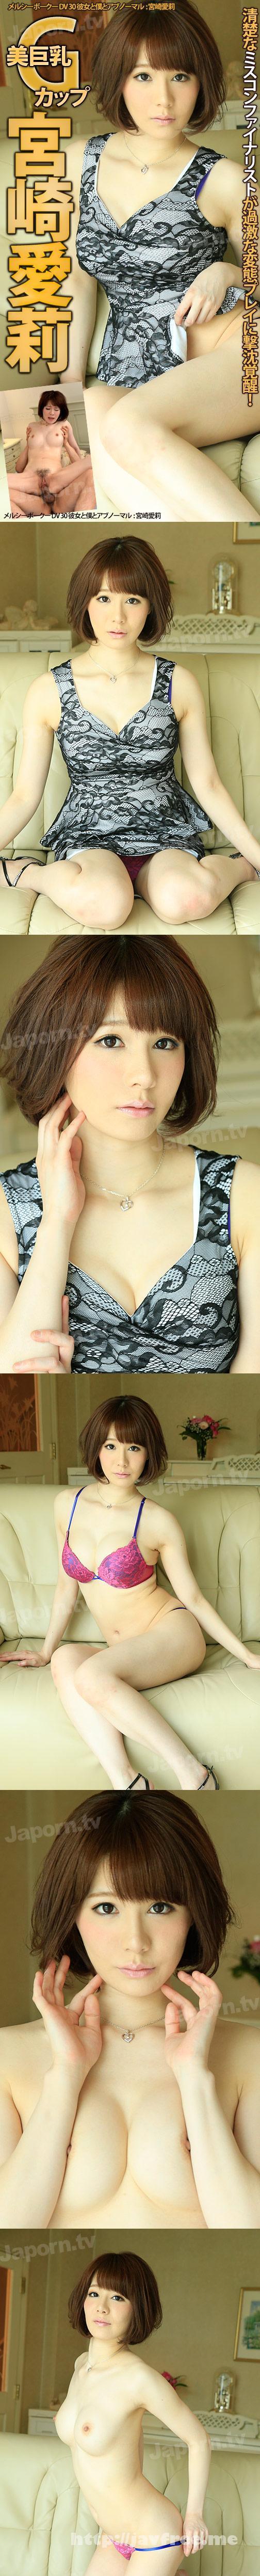 [MCDV 30] メルシーボークー DV 30 彼女と僕とアブノーマル : 宮崎愛莉 宮崎愛莉 MCDV Airi Miyazaki